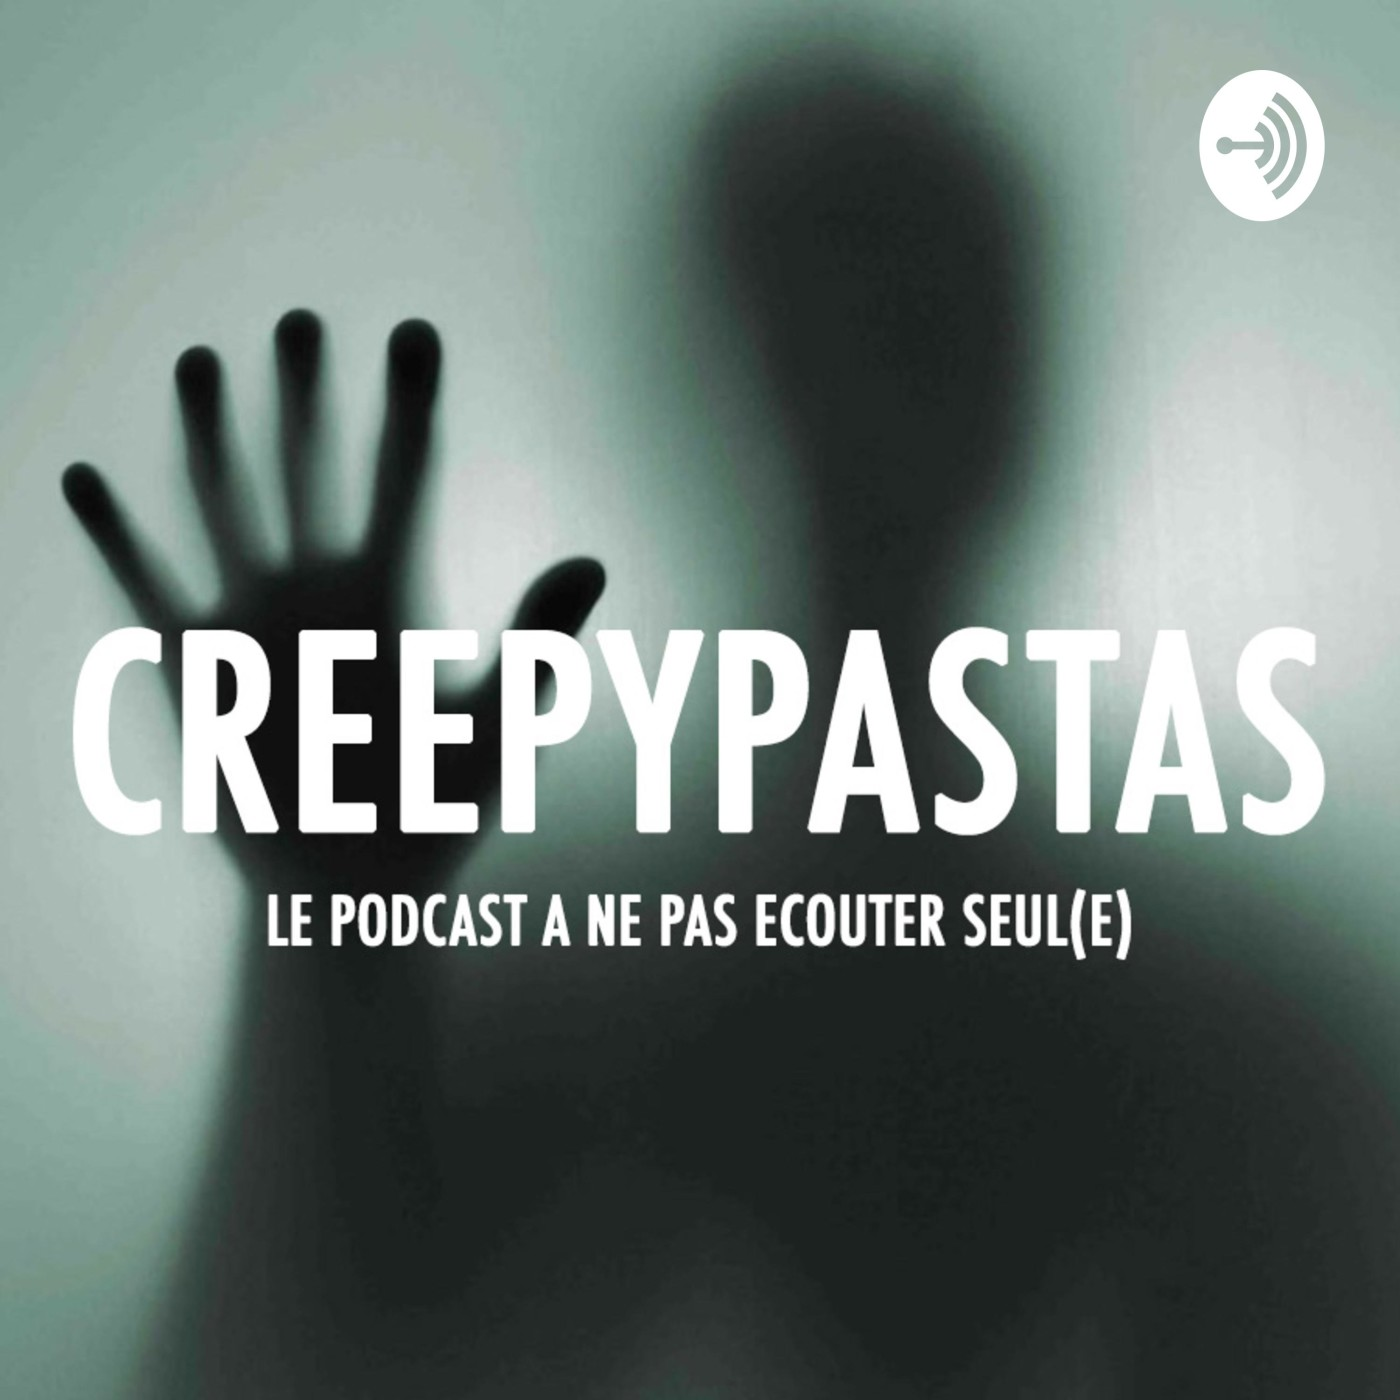 CREEPYPASTA EP.007 - Ne joue jamais au Ouija - Podcast horreur & paranormal